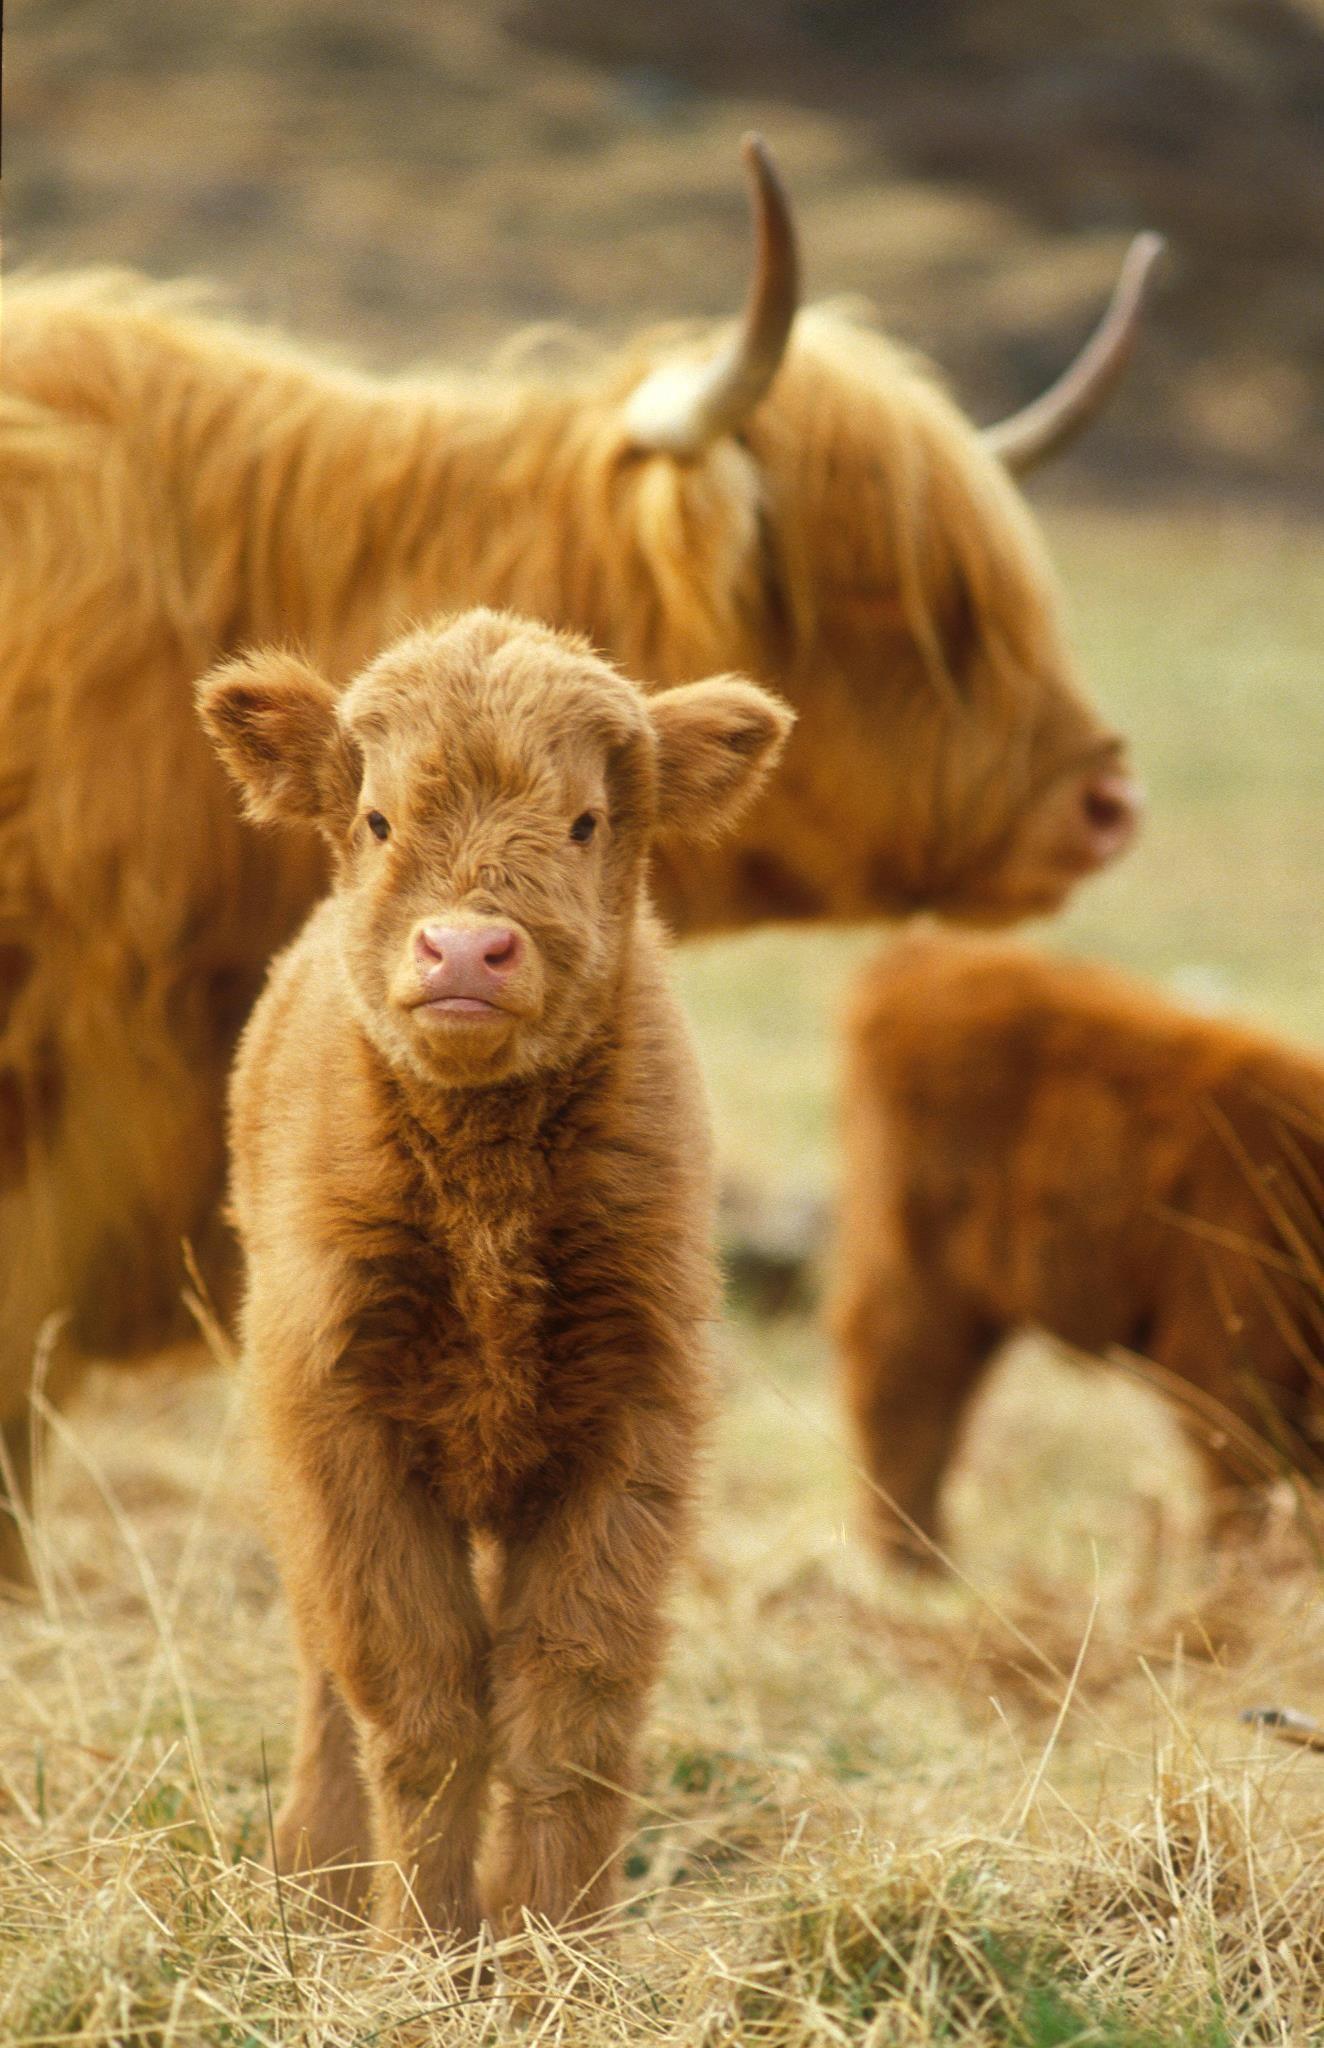 413450e1f33 HAIRY COOOOOOOOO! I fell in love with these creatures in Scotland. The  babies look like ewoks.  D